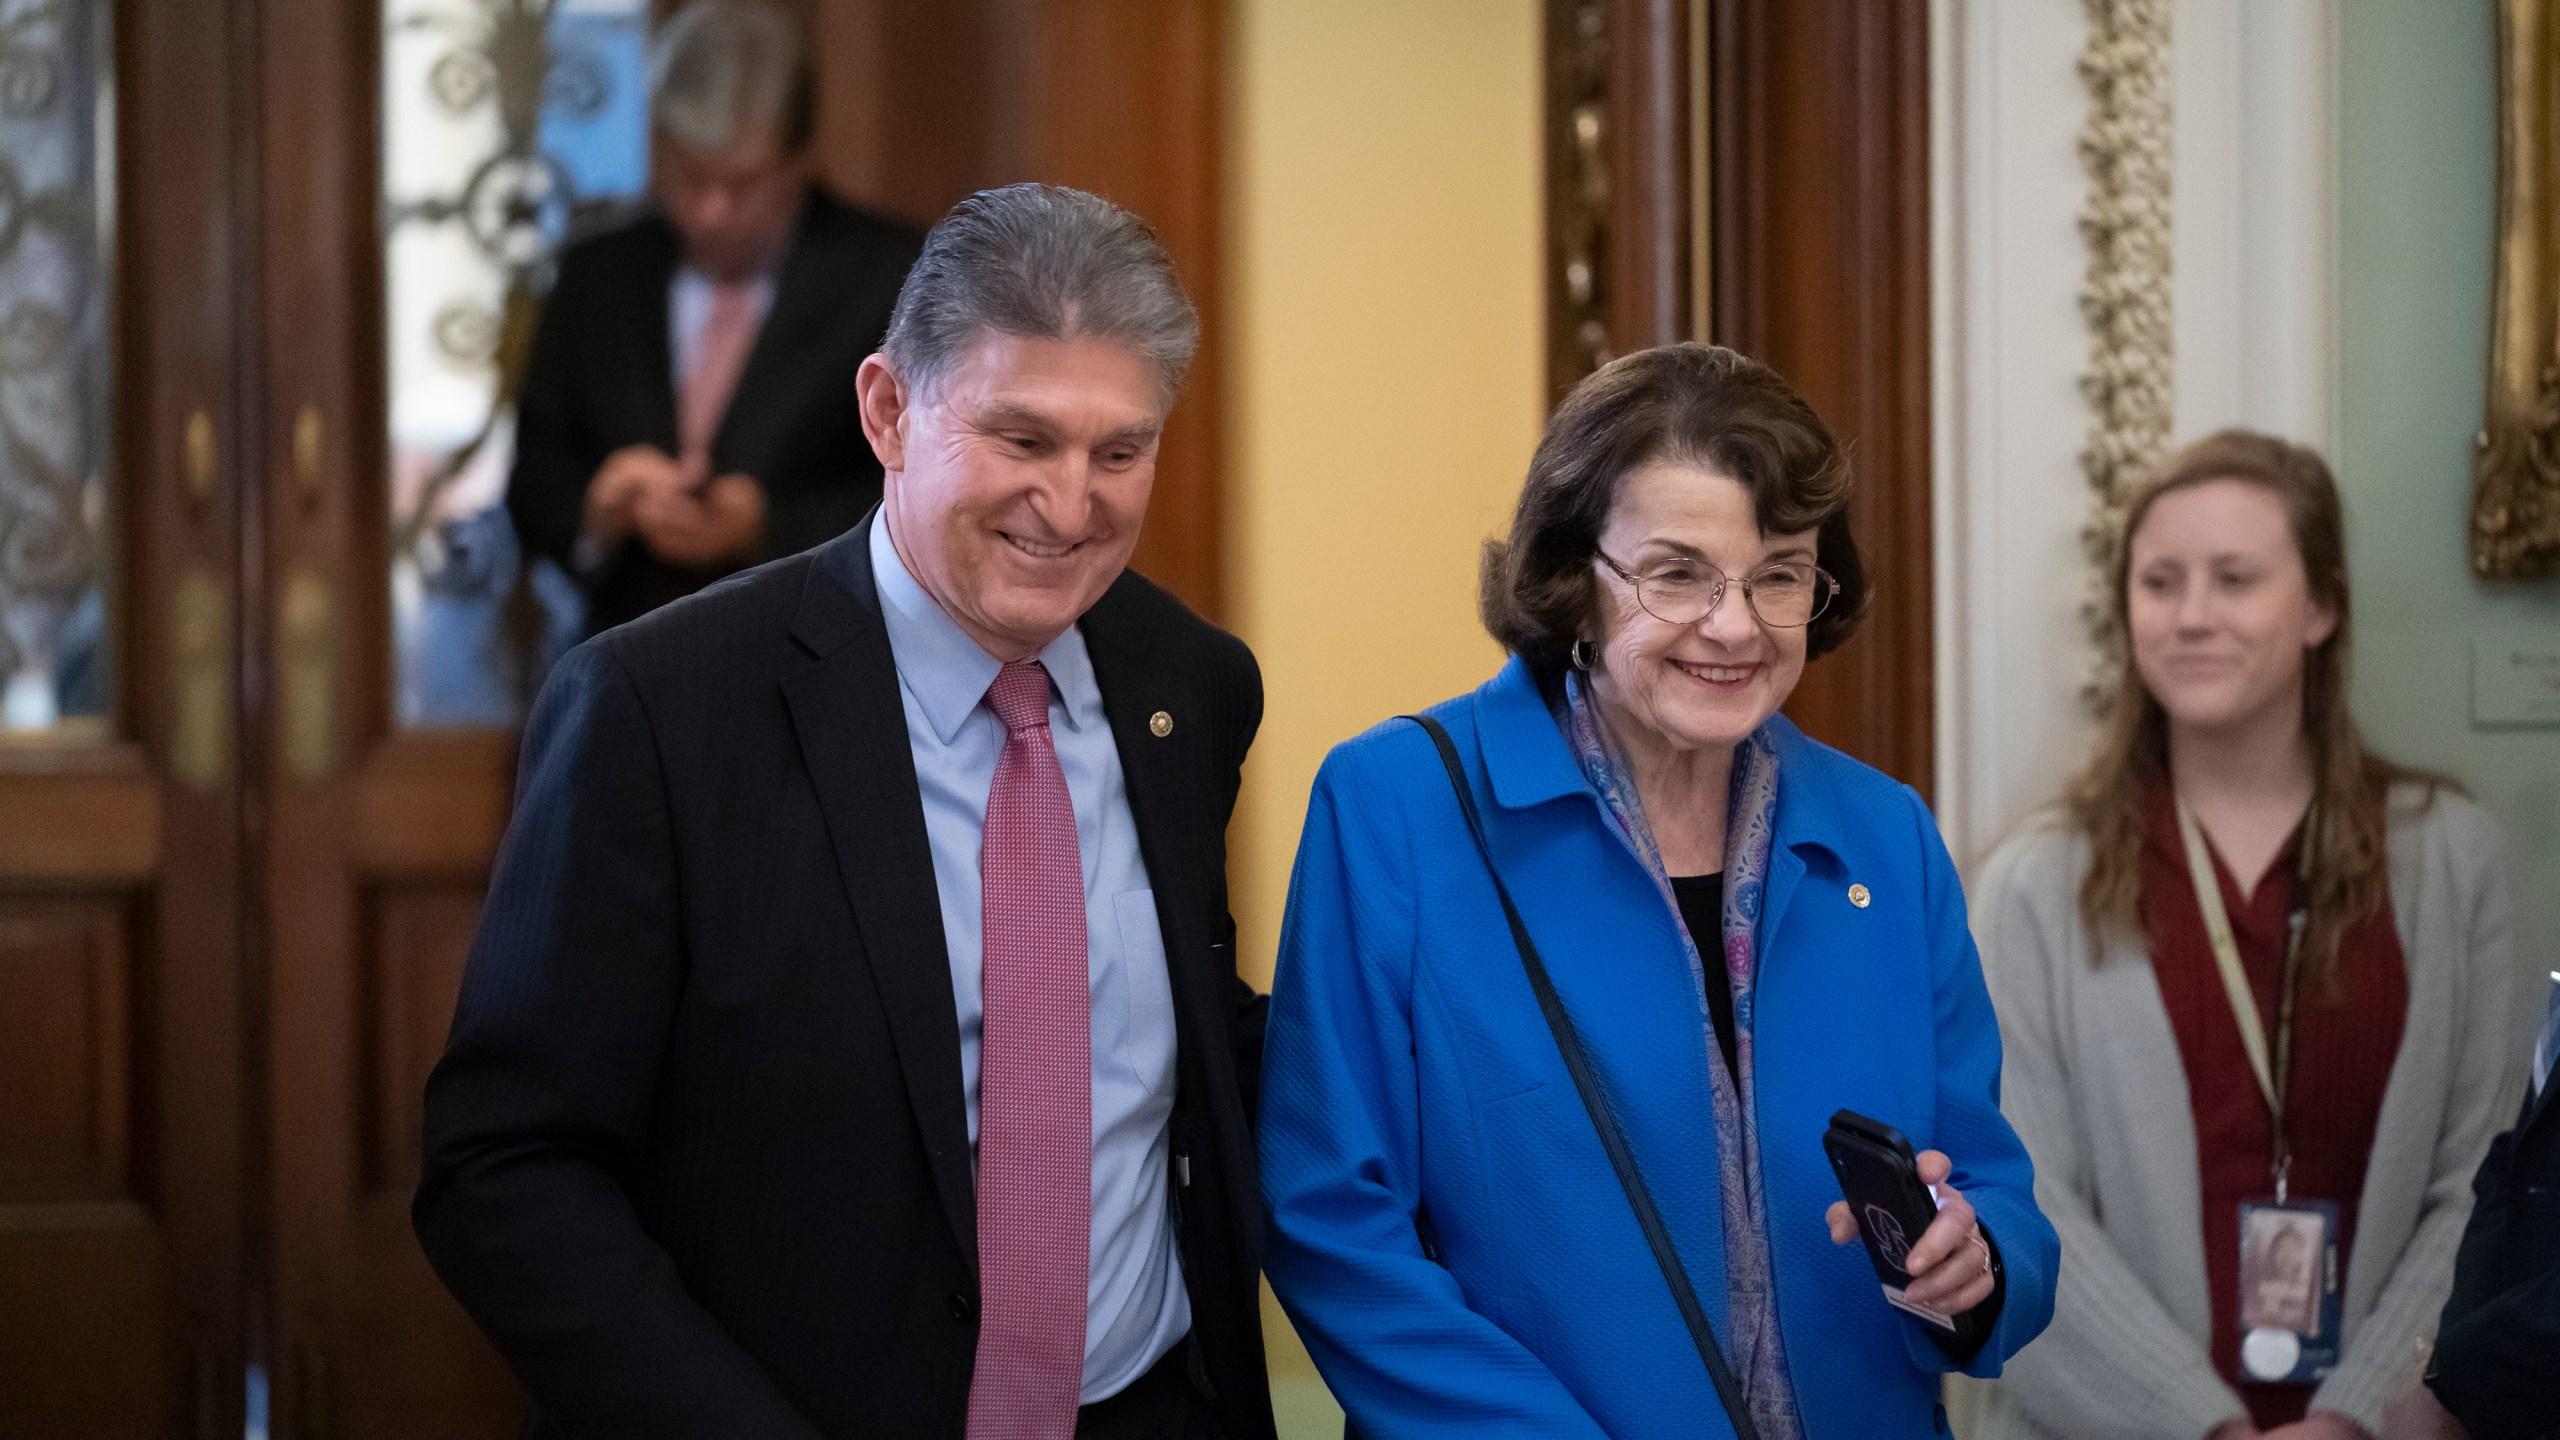 In this Jan. 31, 2020 file photo, Sen. Joe Manchin, D-W.Va., left, and Sen. Dianne Feinstein, D-Calif., walk in the Capitol in Washington. (AP Photo/J. Scott Applewhite)